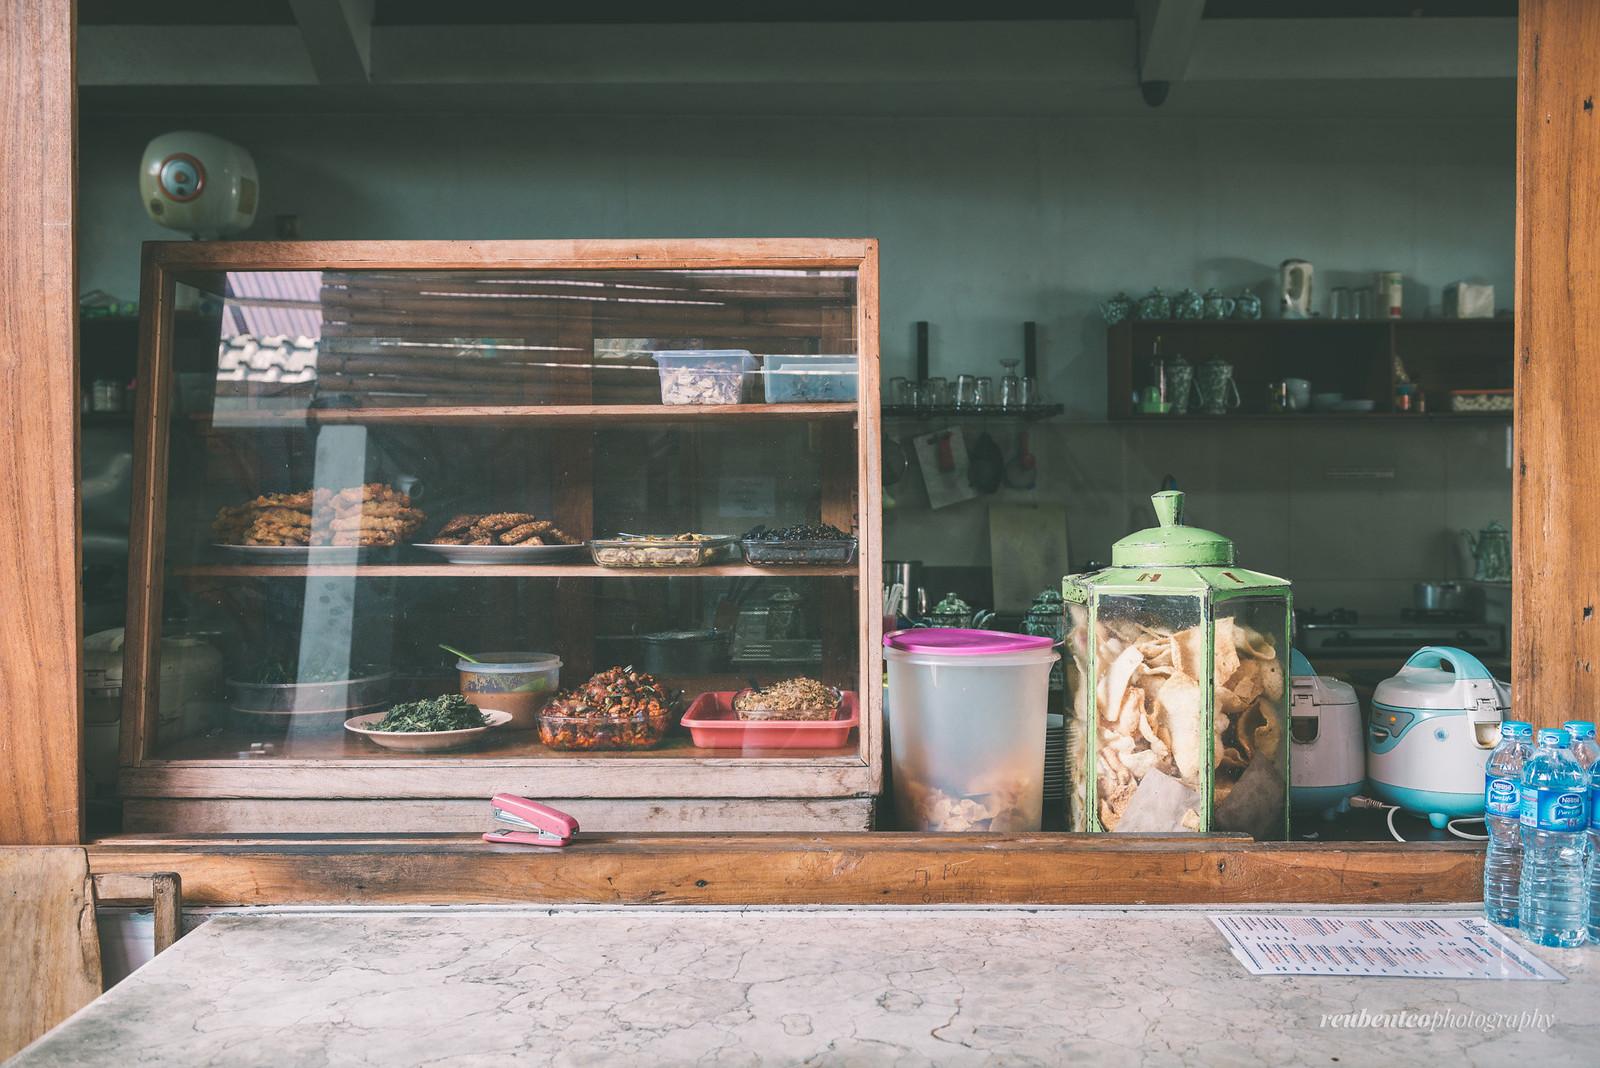 Lunchtime in Yogyakarta